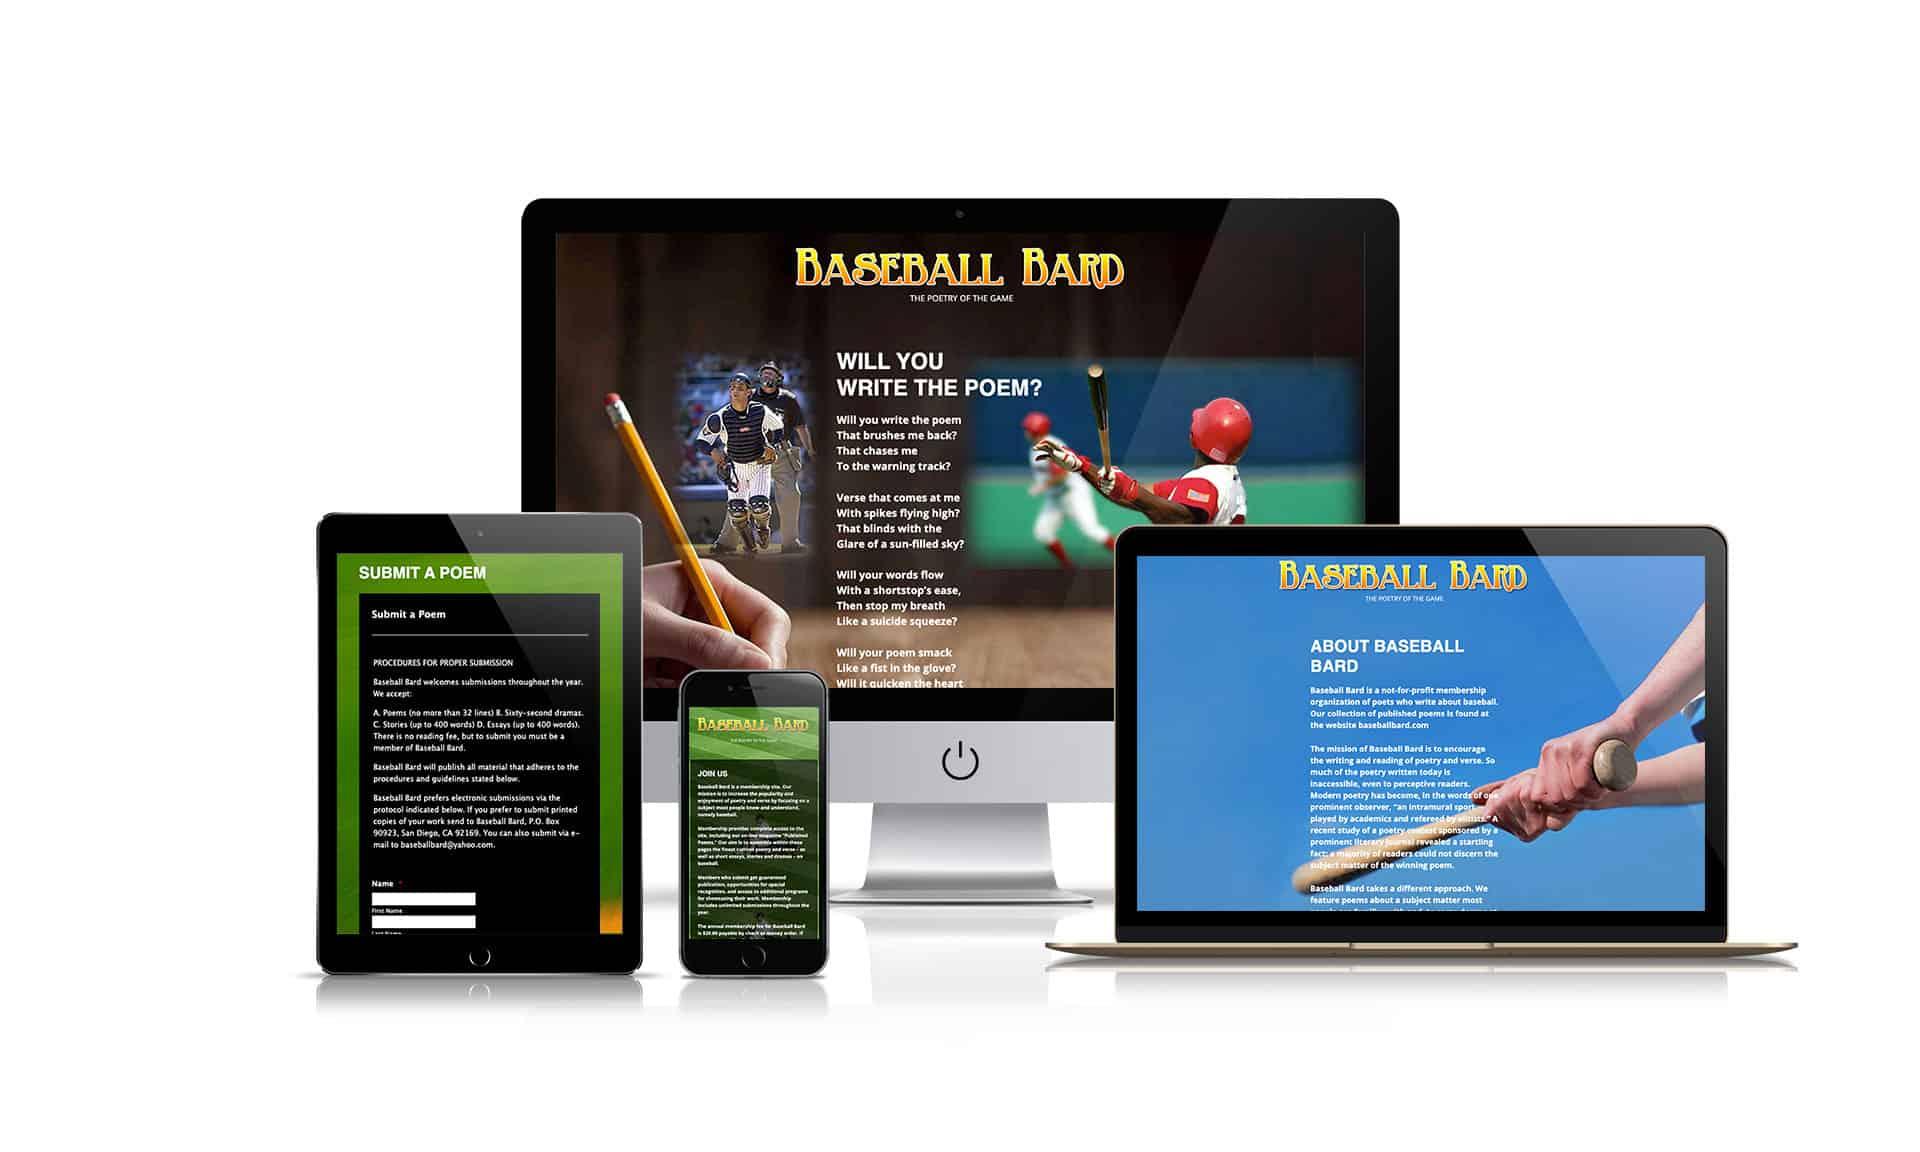 Baseball Bard - Website Design